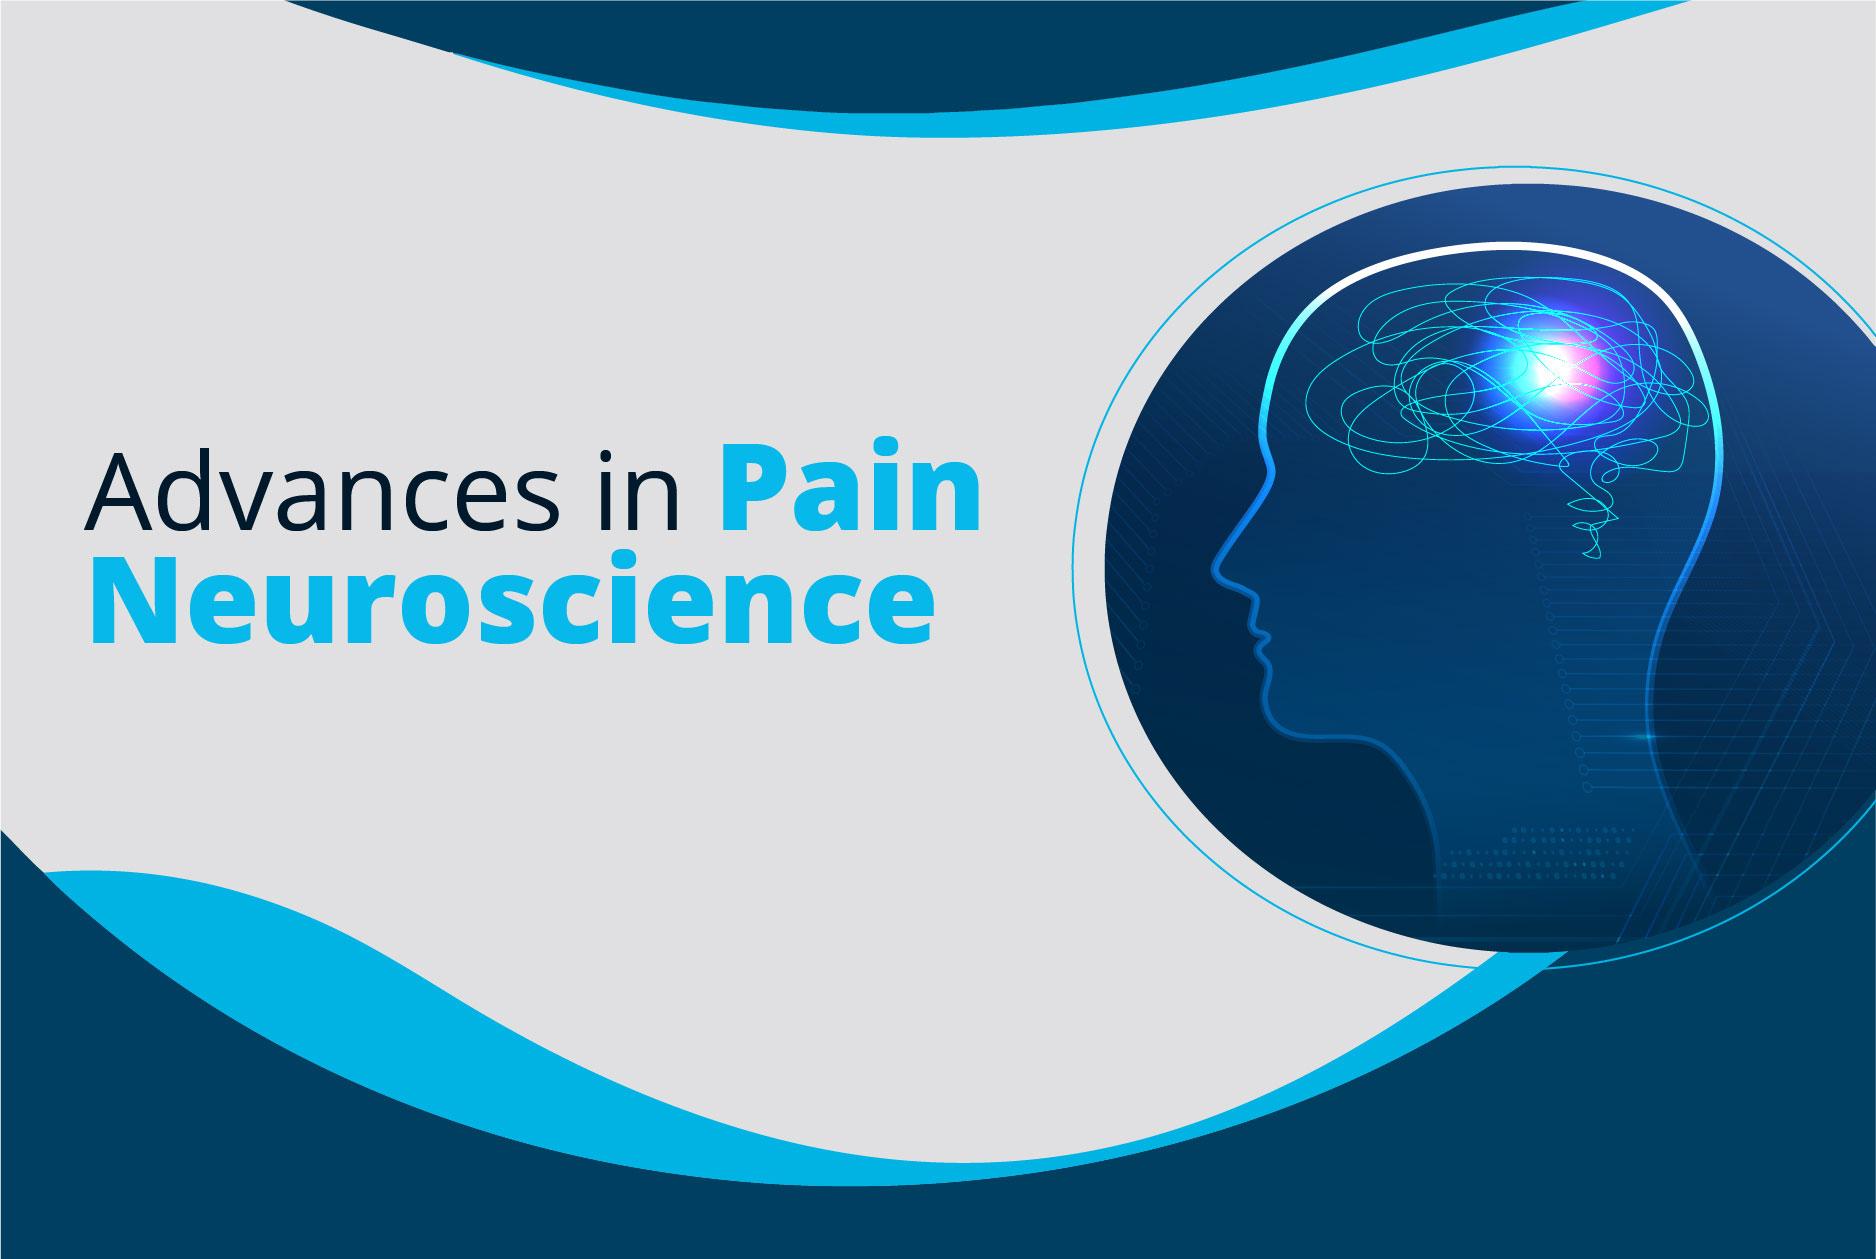 Advances in Pain Neuroscience